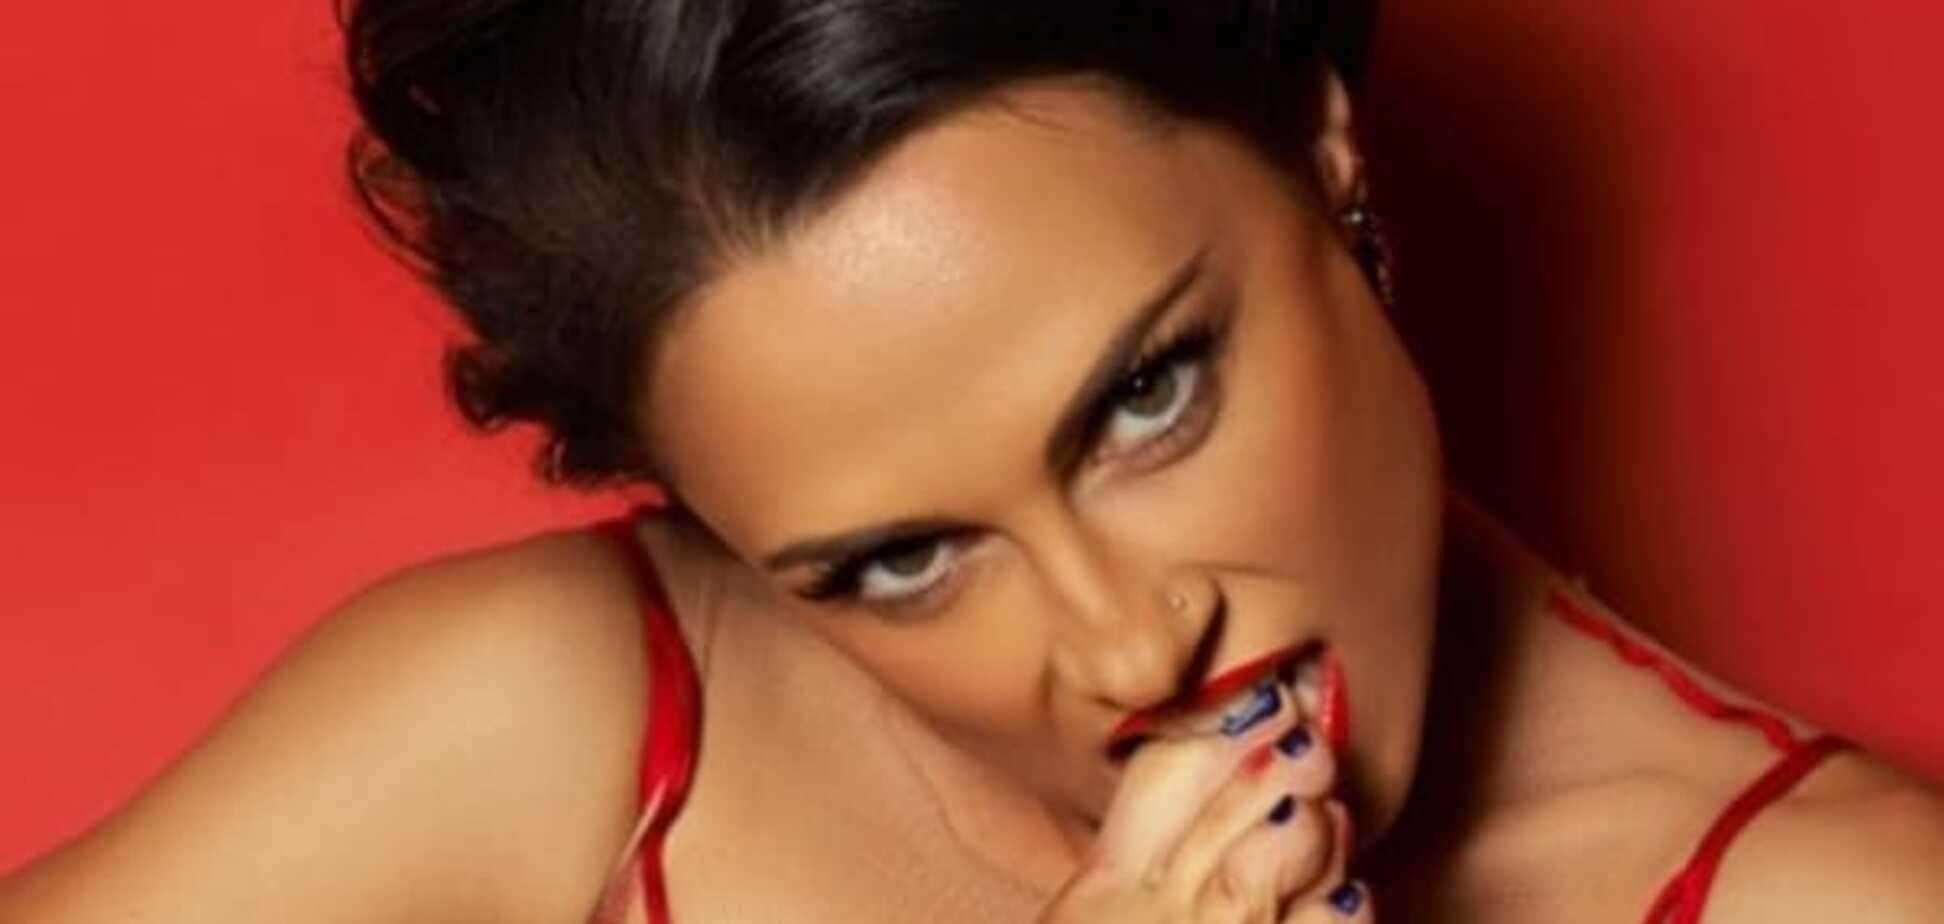 Красотка из 'Nikita' завела блог для любителей садо-мазо: опубликованы фото